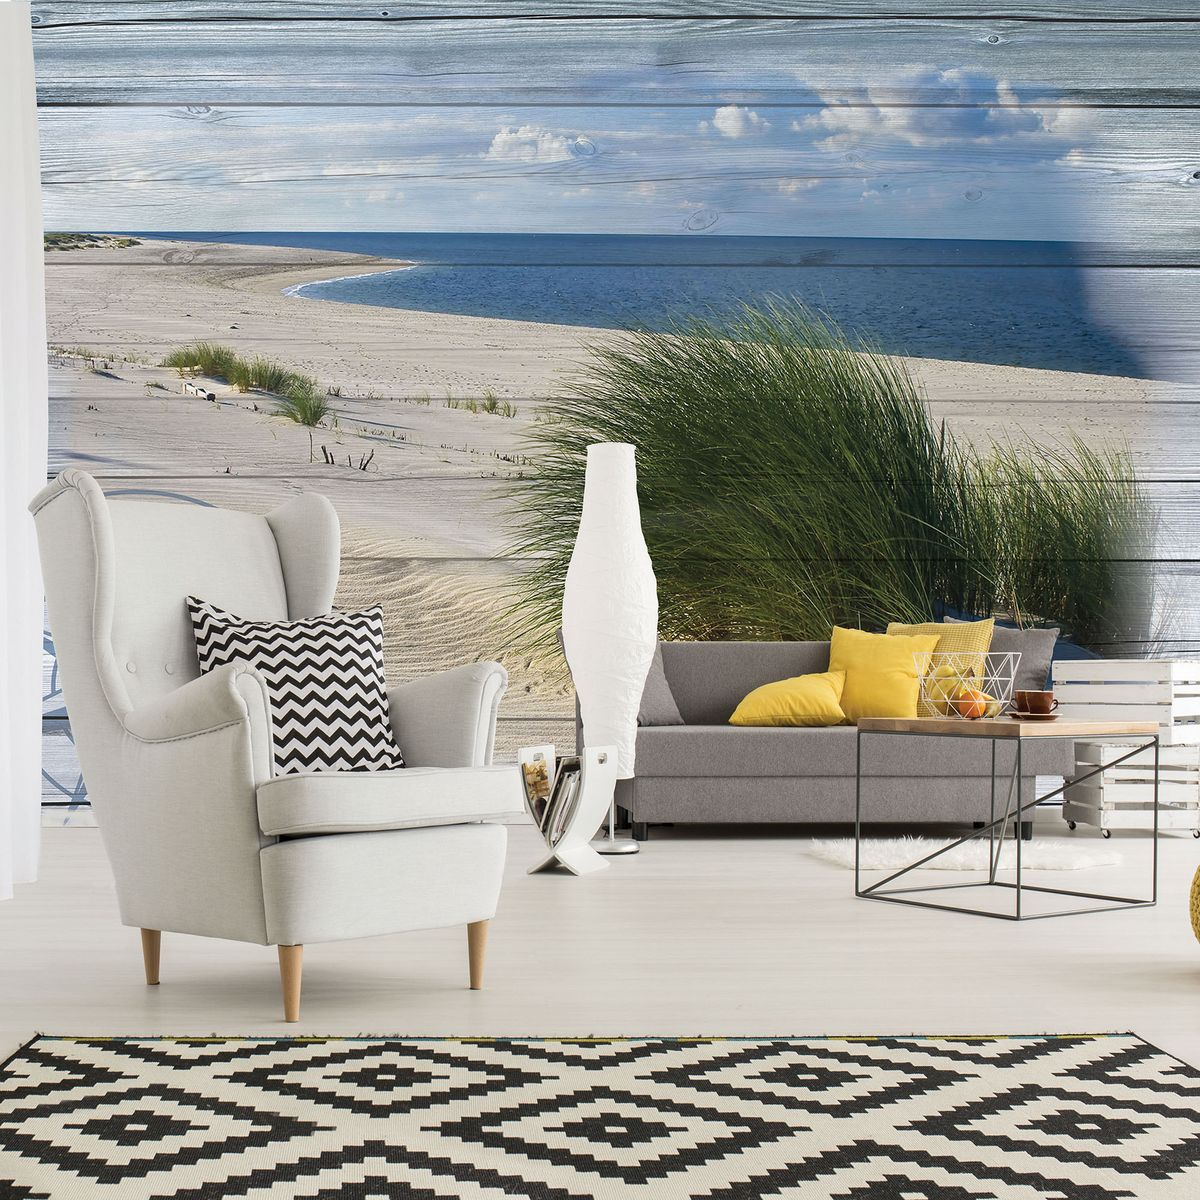 Foto tapeta - Slika plaže - imitacija ploče (T030046T254184A)